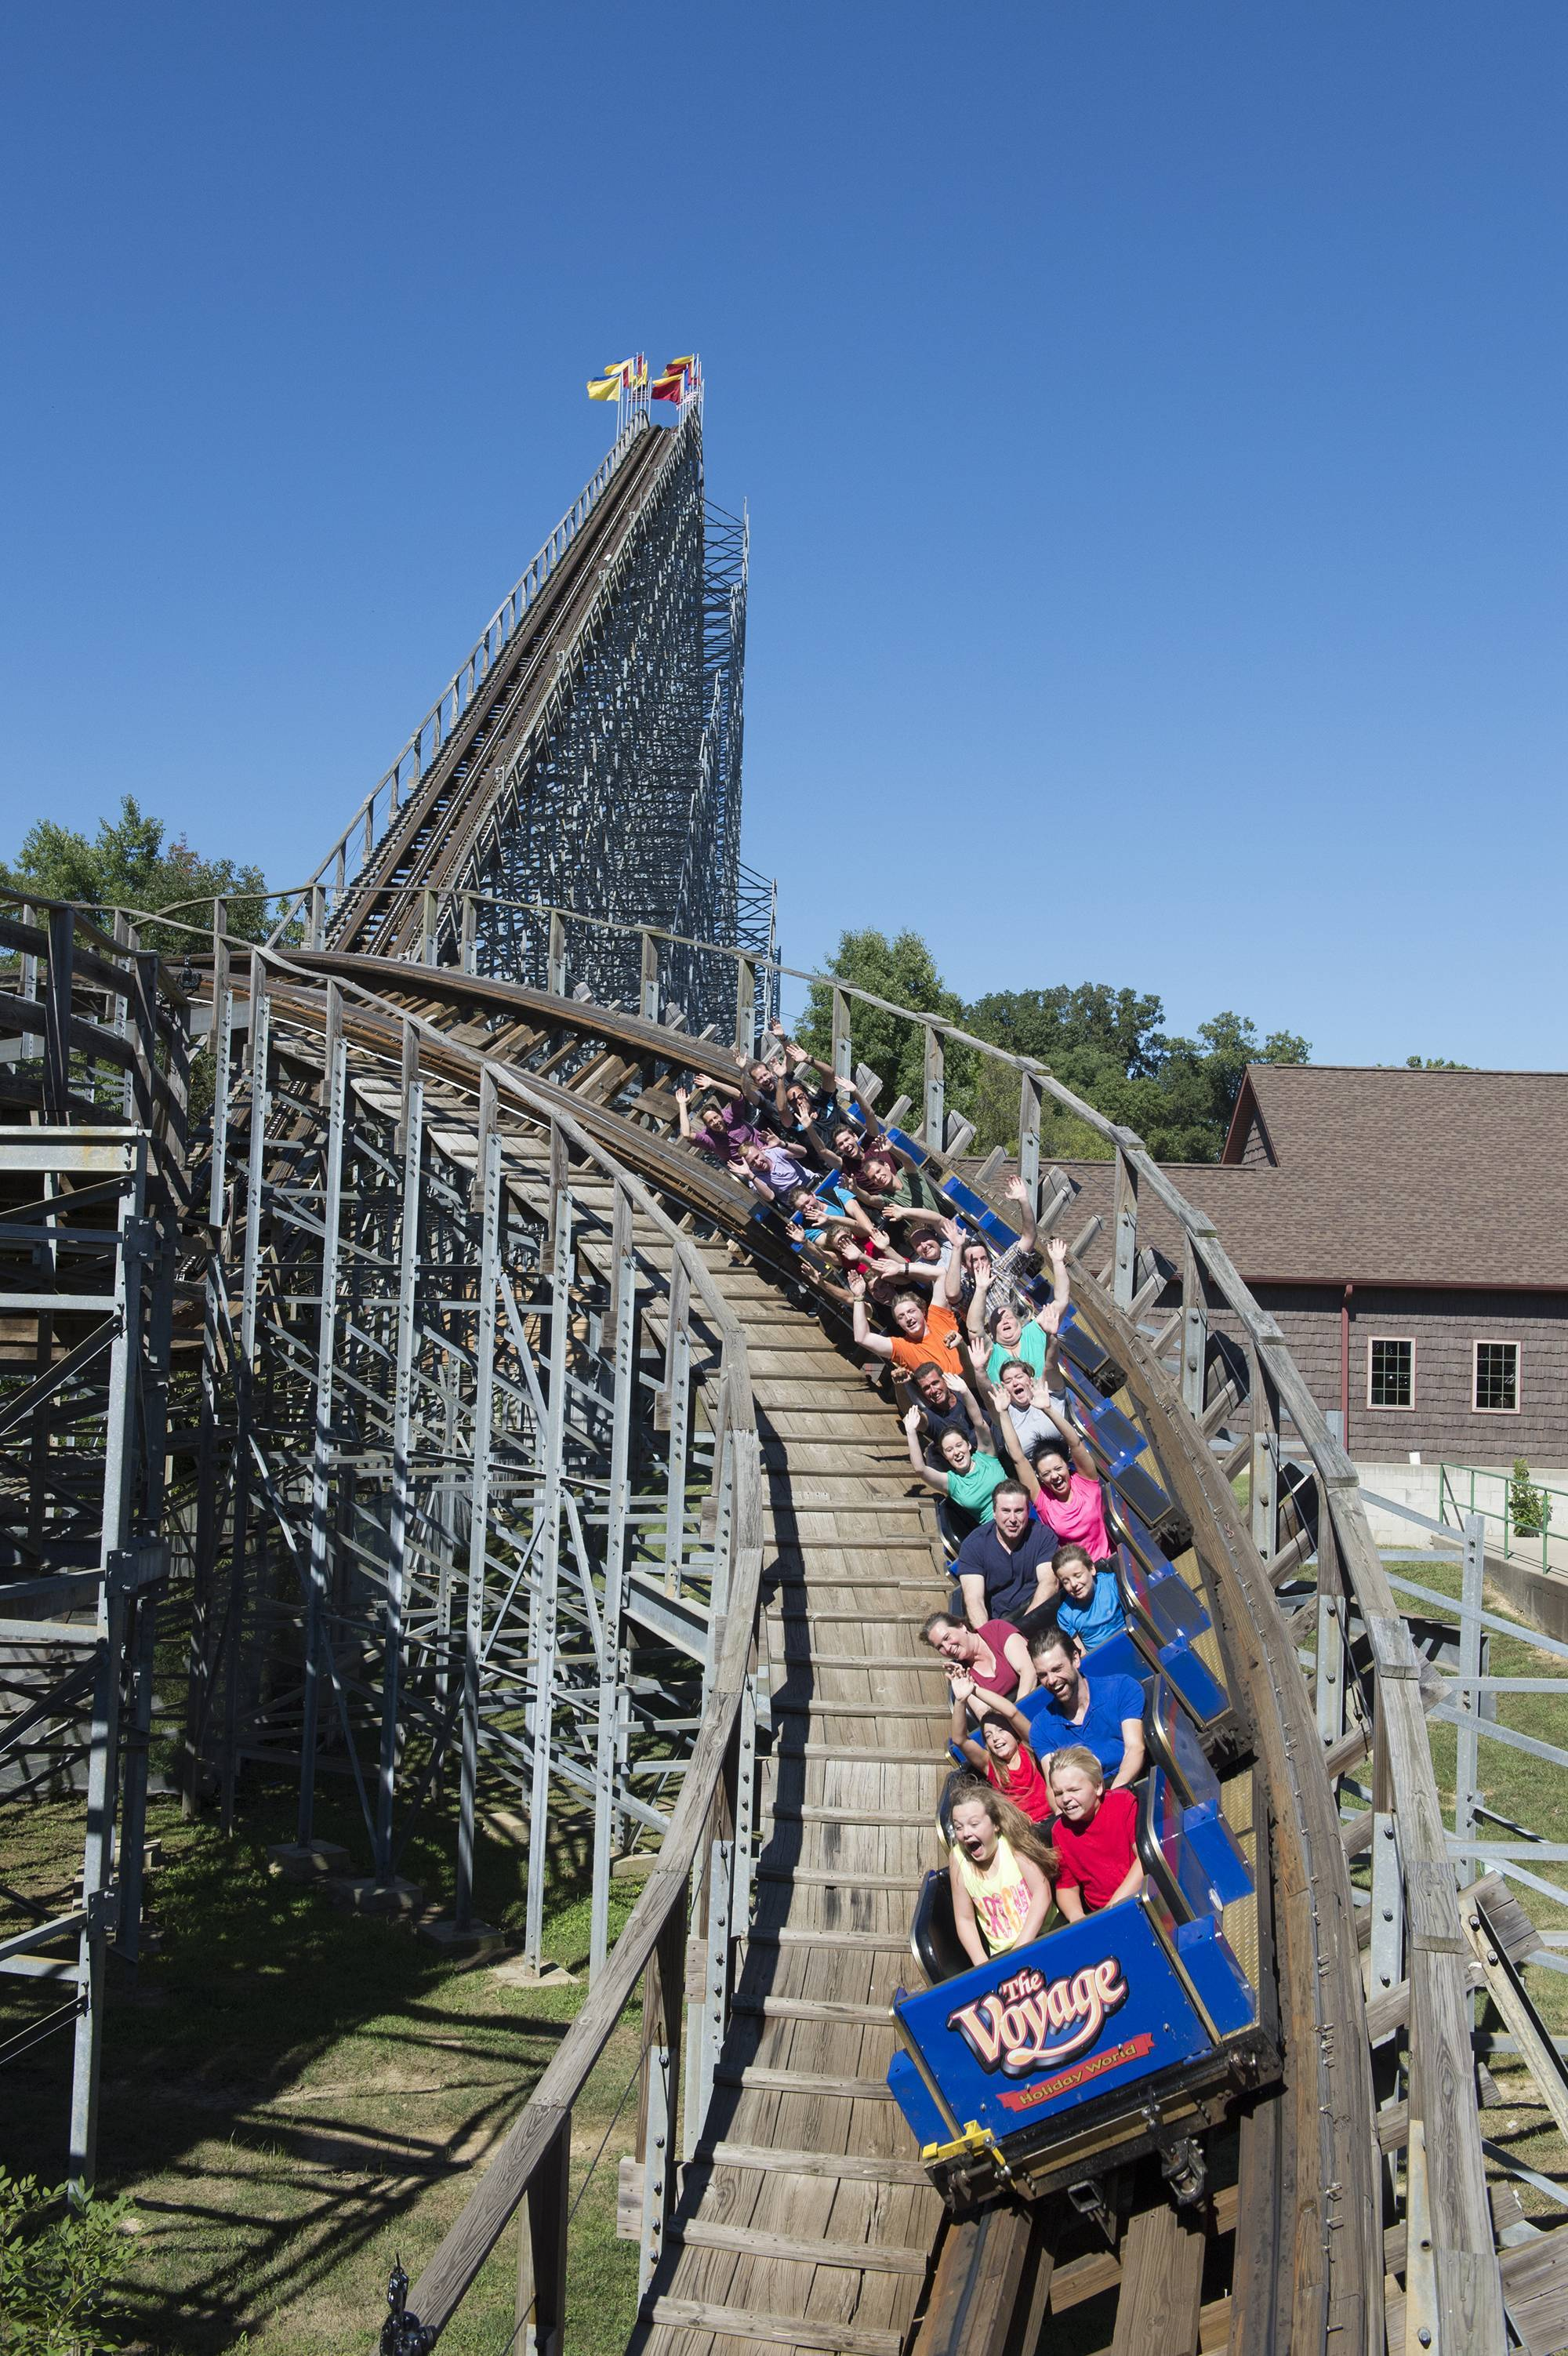 The Voyage Wooden Roller Coaster Holiday World Splashin Safari